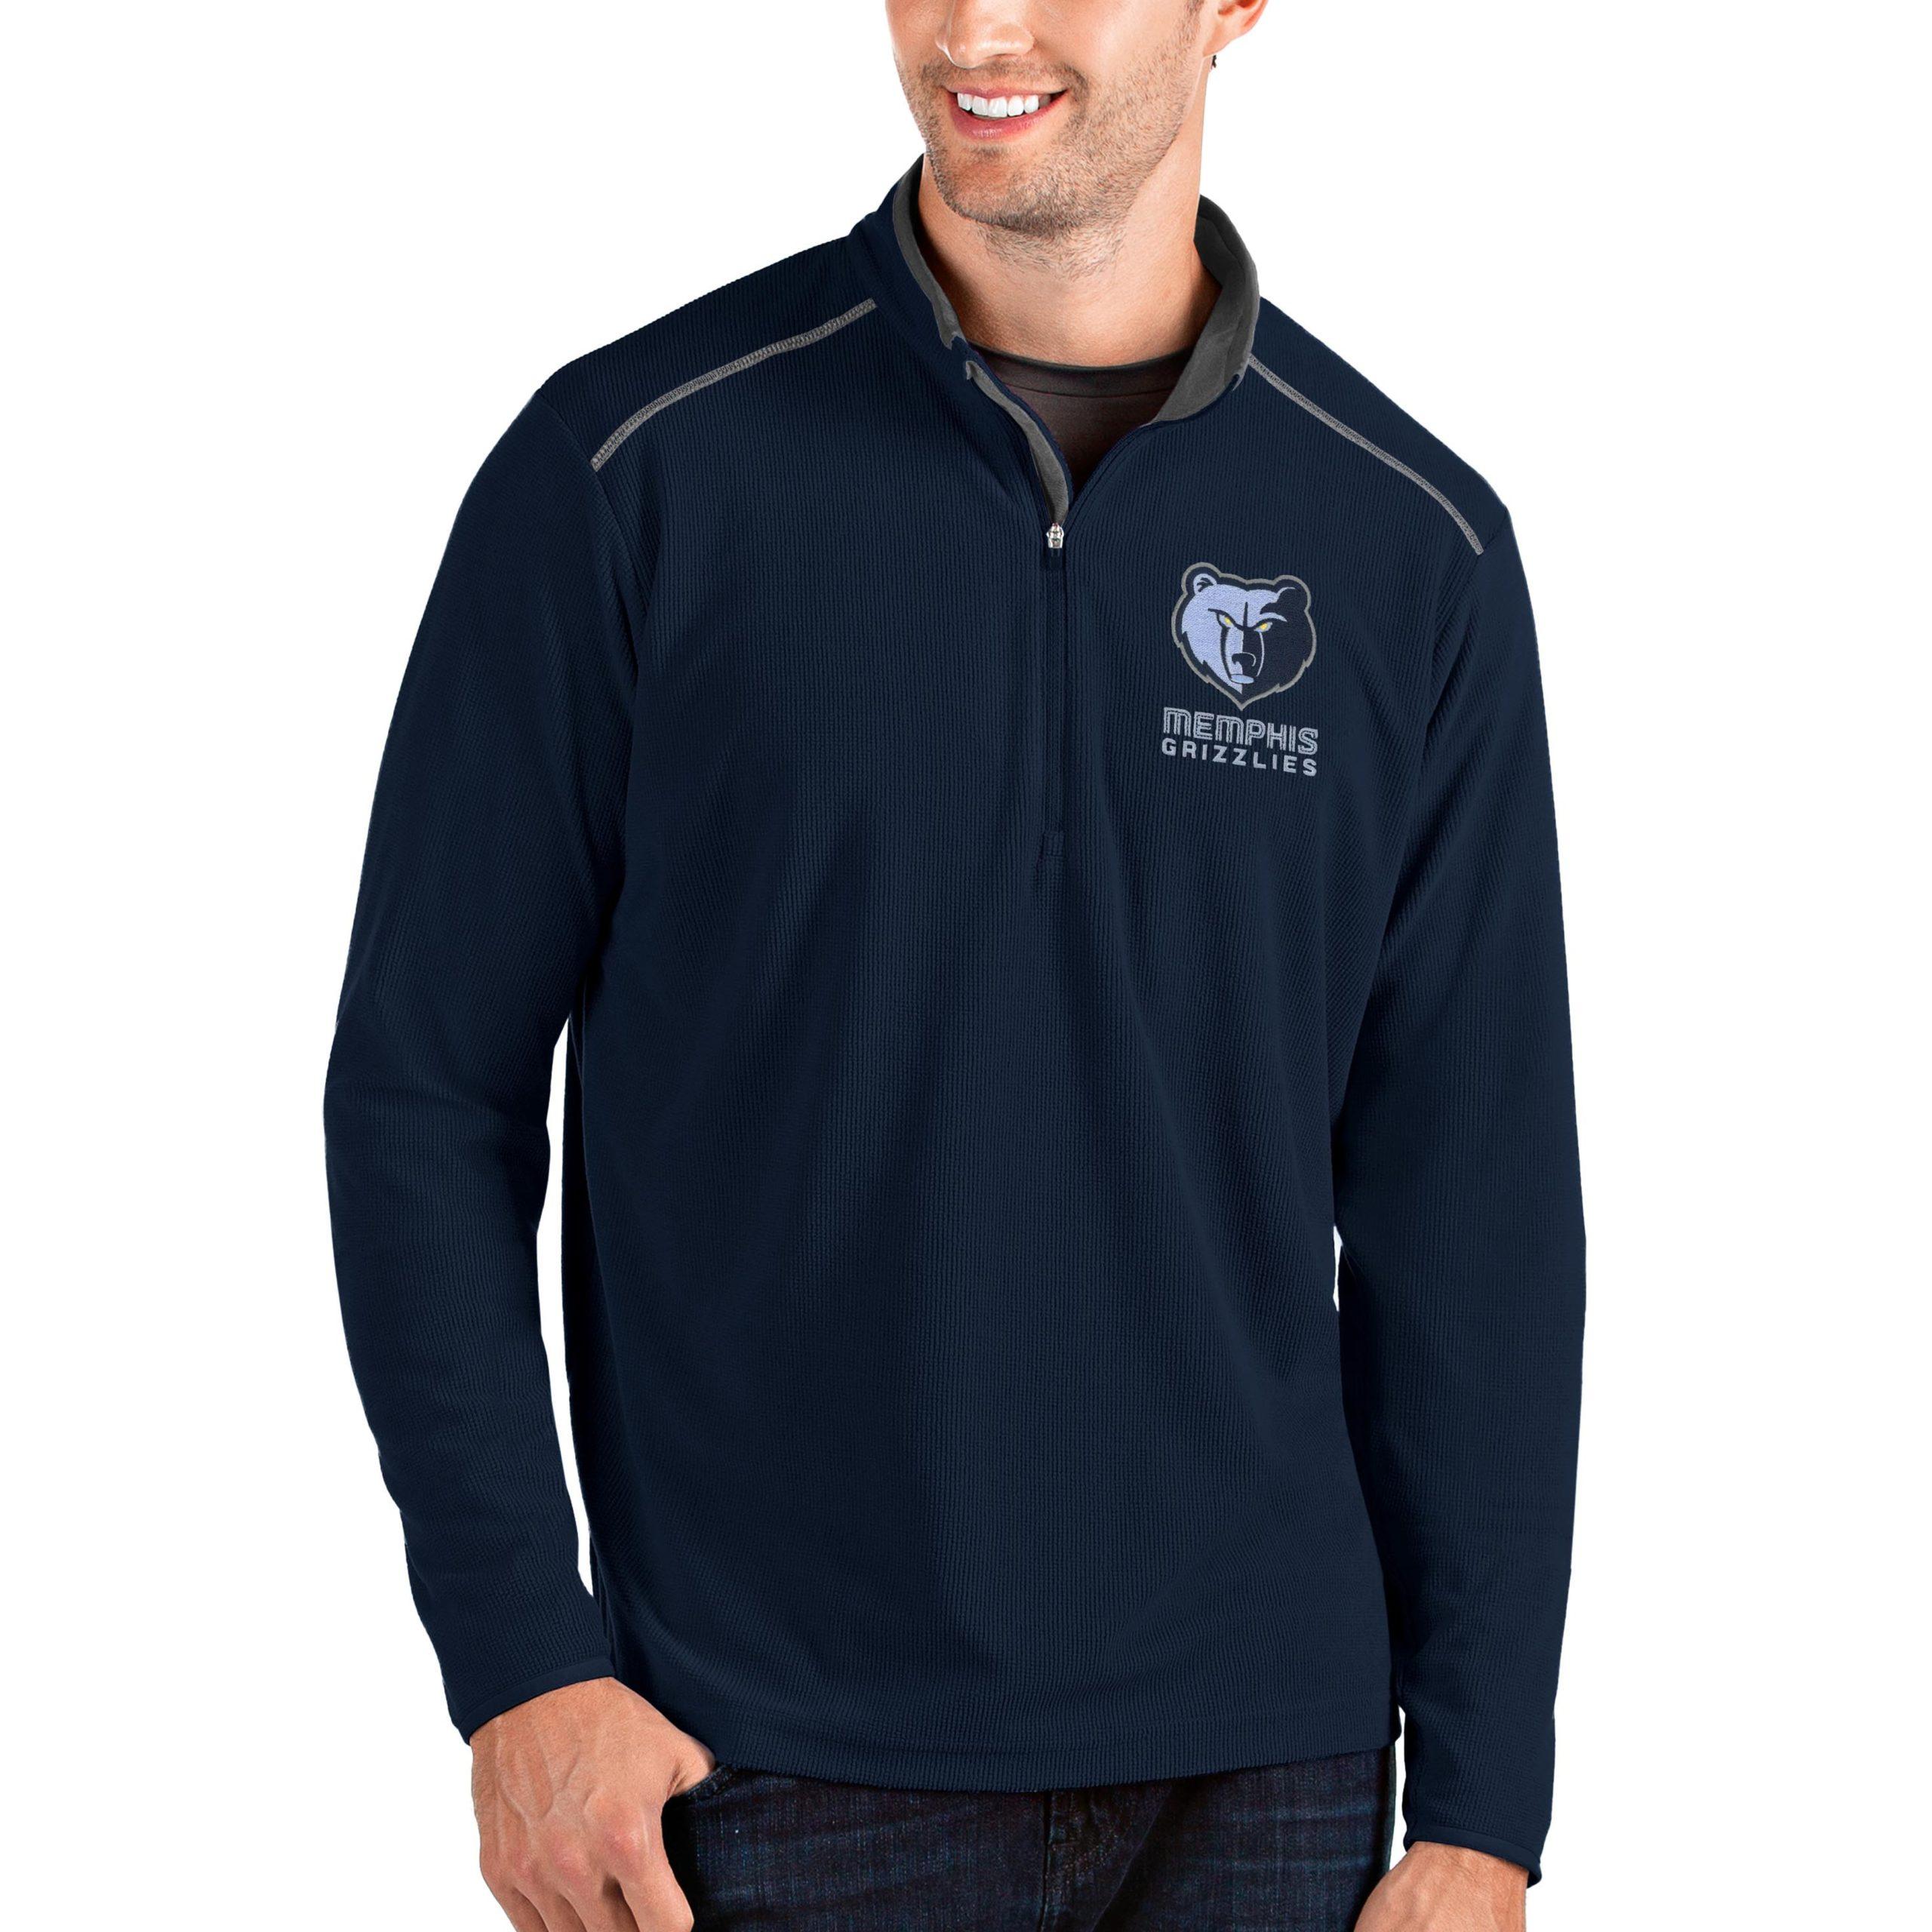 Memphis Grizzlies Antigua Big & Tall Glacier Quarter-Zip Pullover Jacket - Navy/Gray